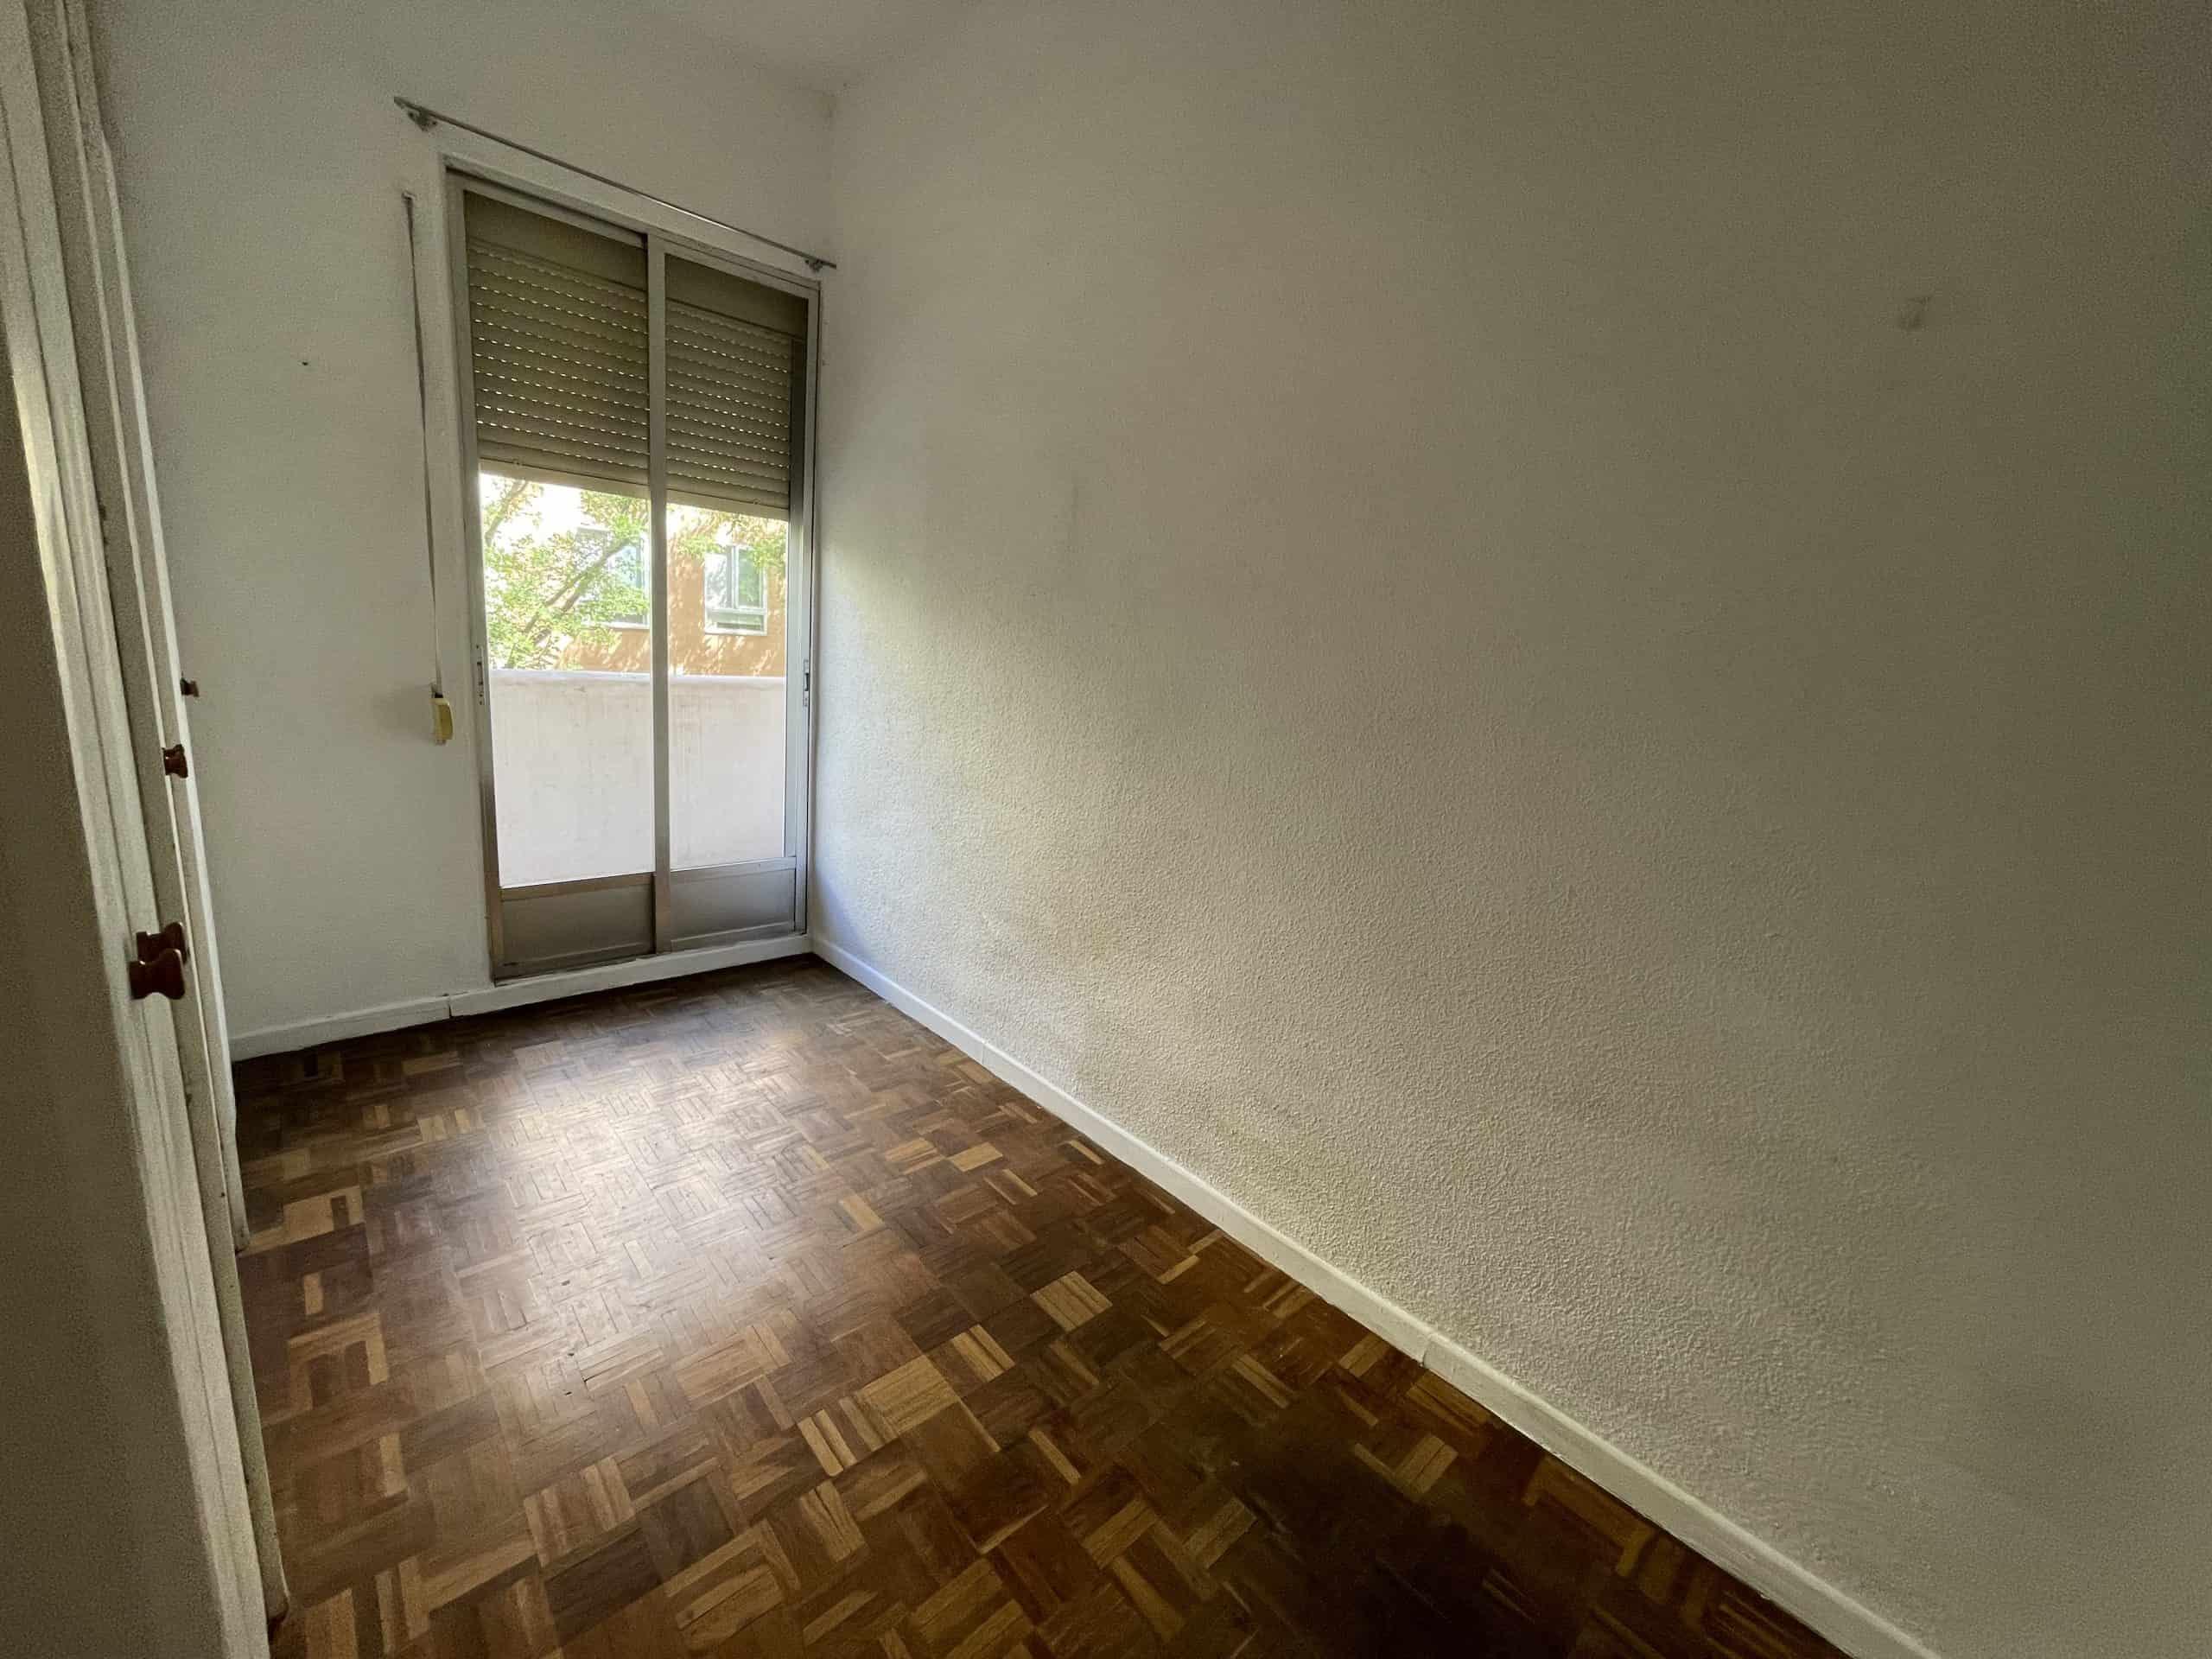 Dormitorio 2.5